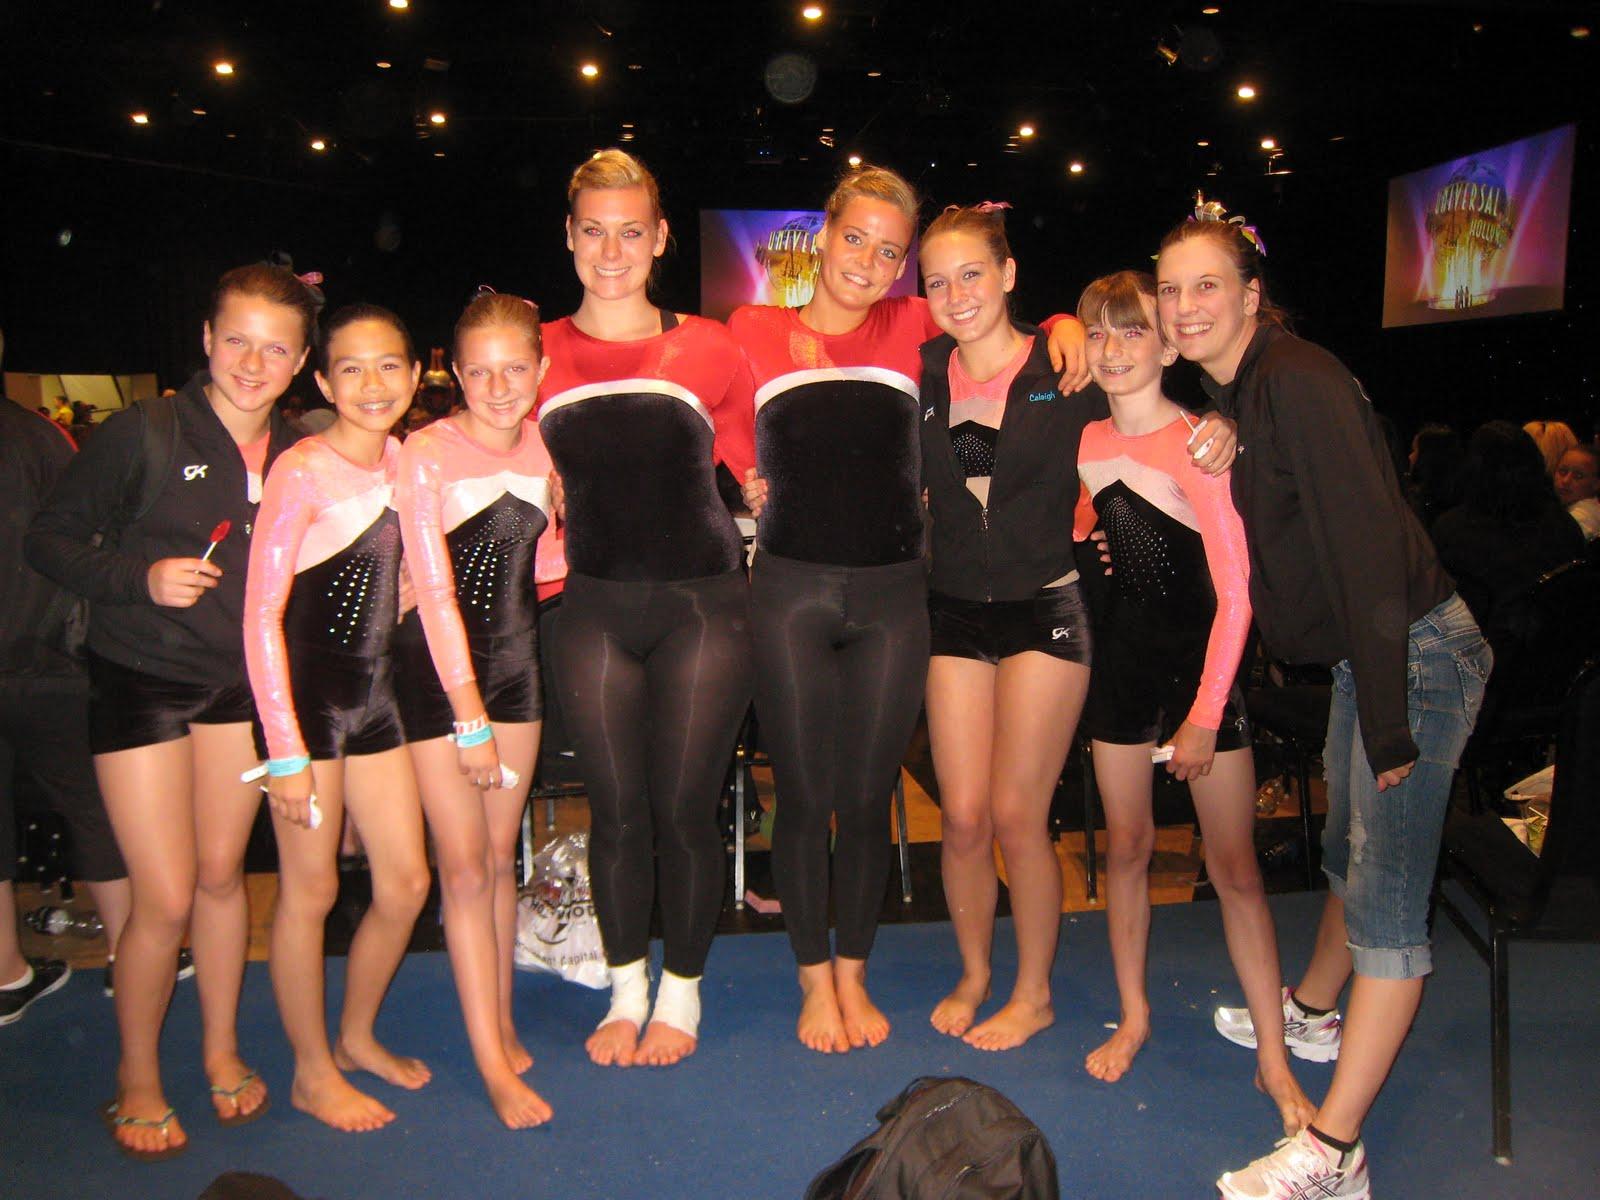 ueg live gymnastics meet